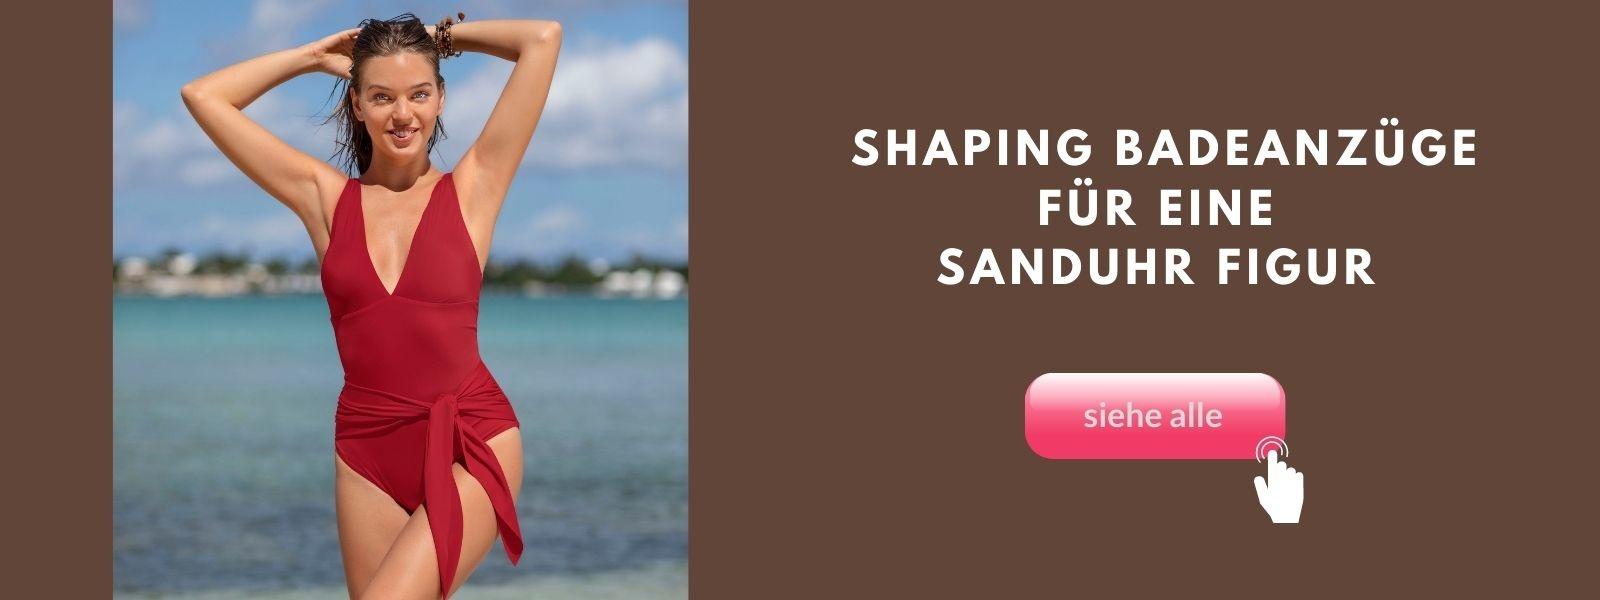 sanduhr figur shaping badeanzug